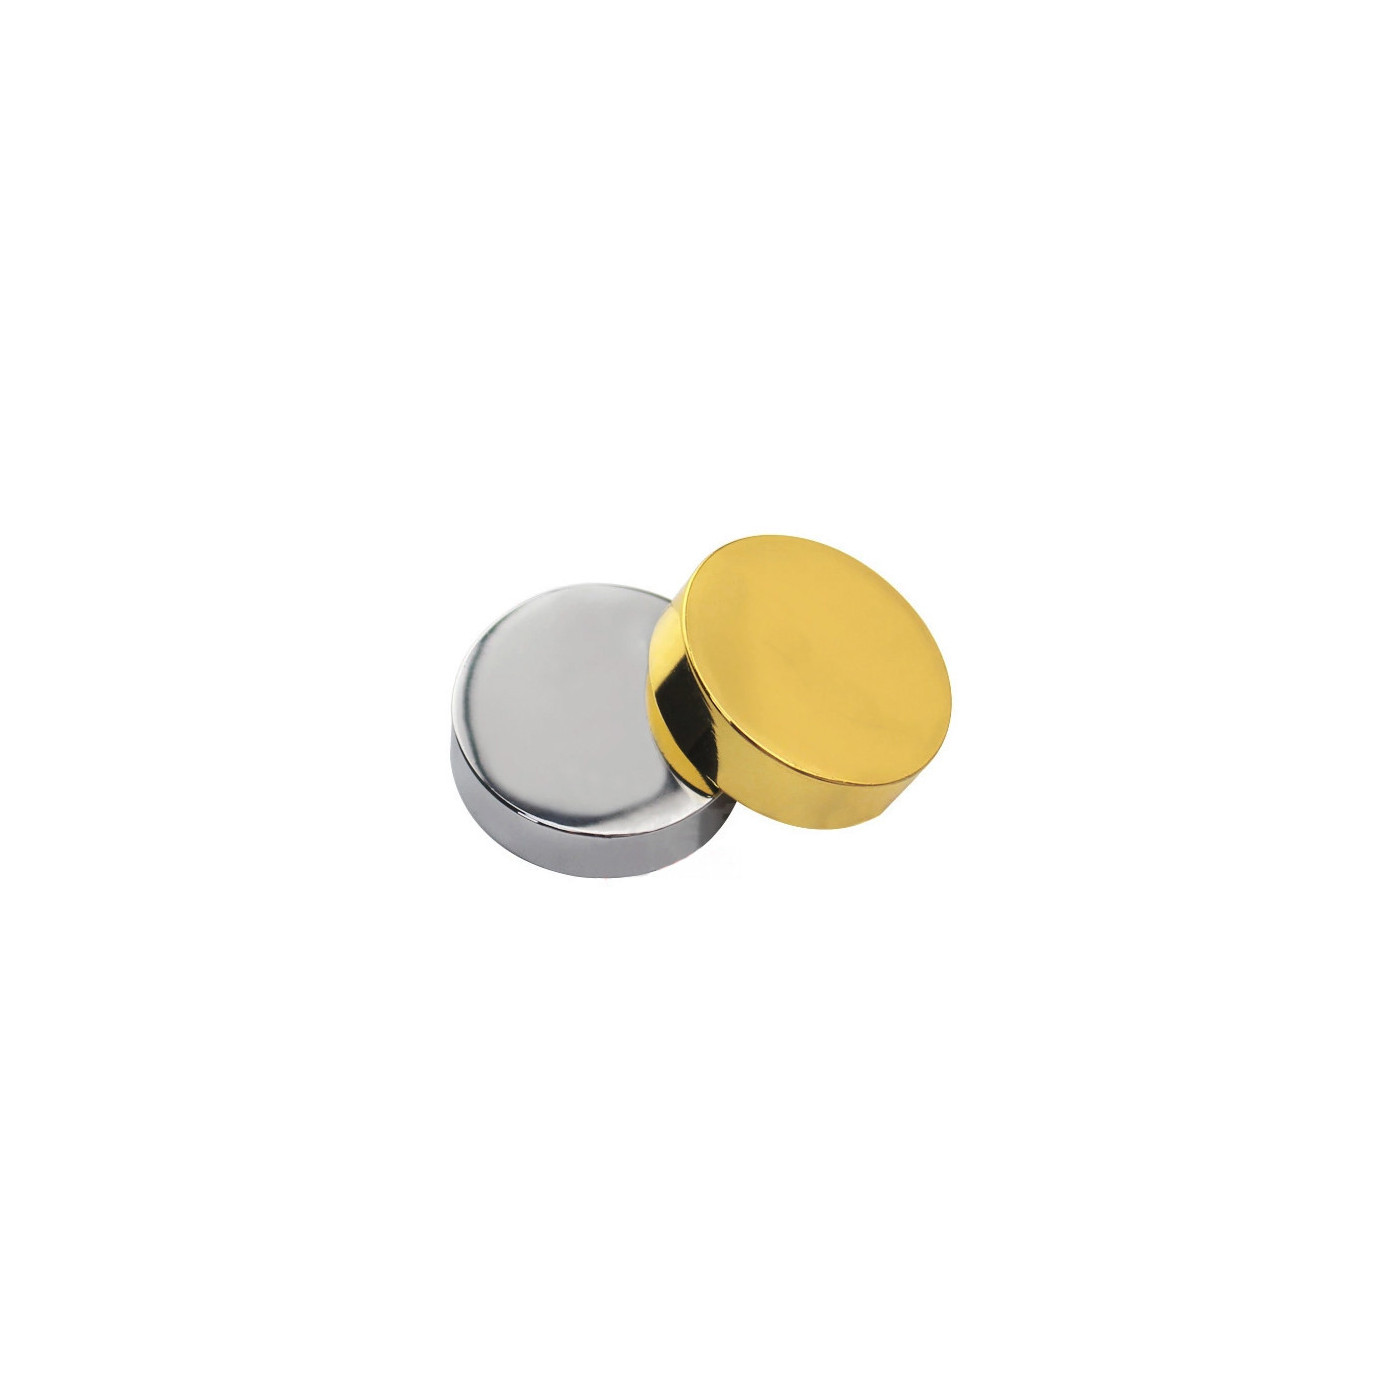 Conjunto de 24 tapas decorativas de metal, plata 11.5x5.0 mm  - 1